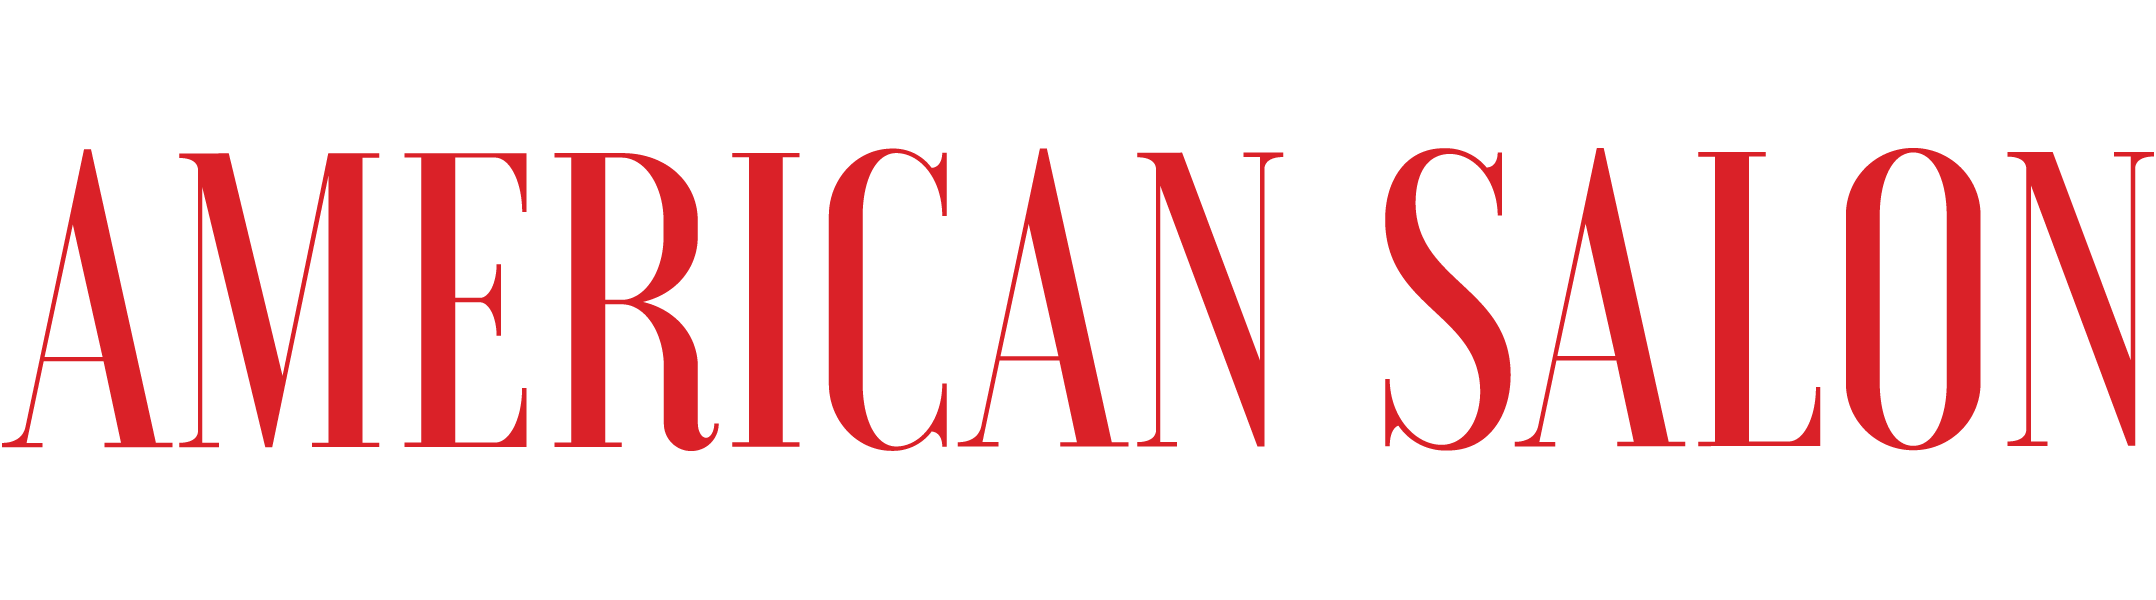 American Salon Logo2